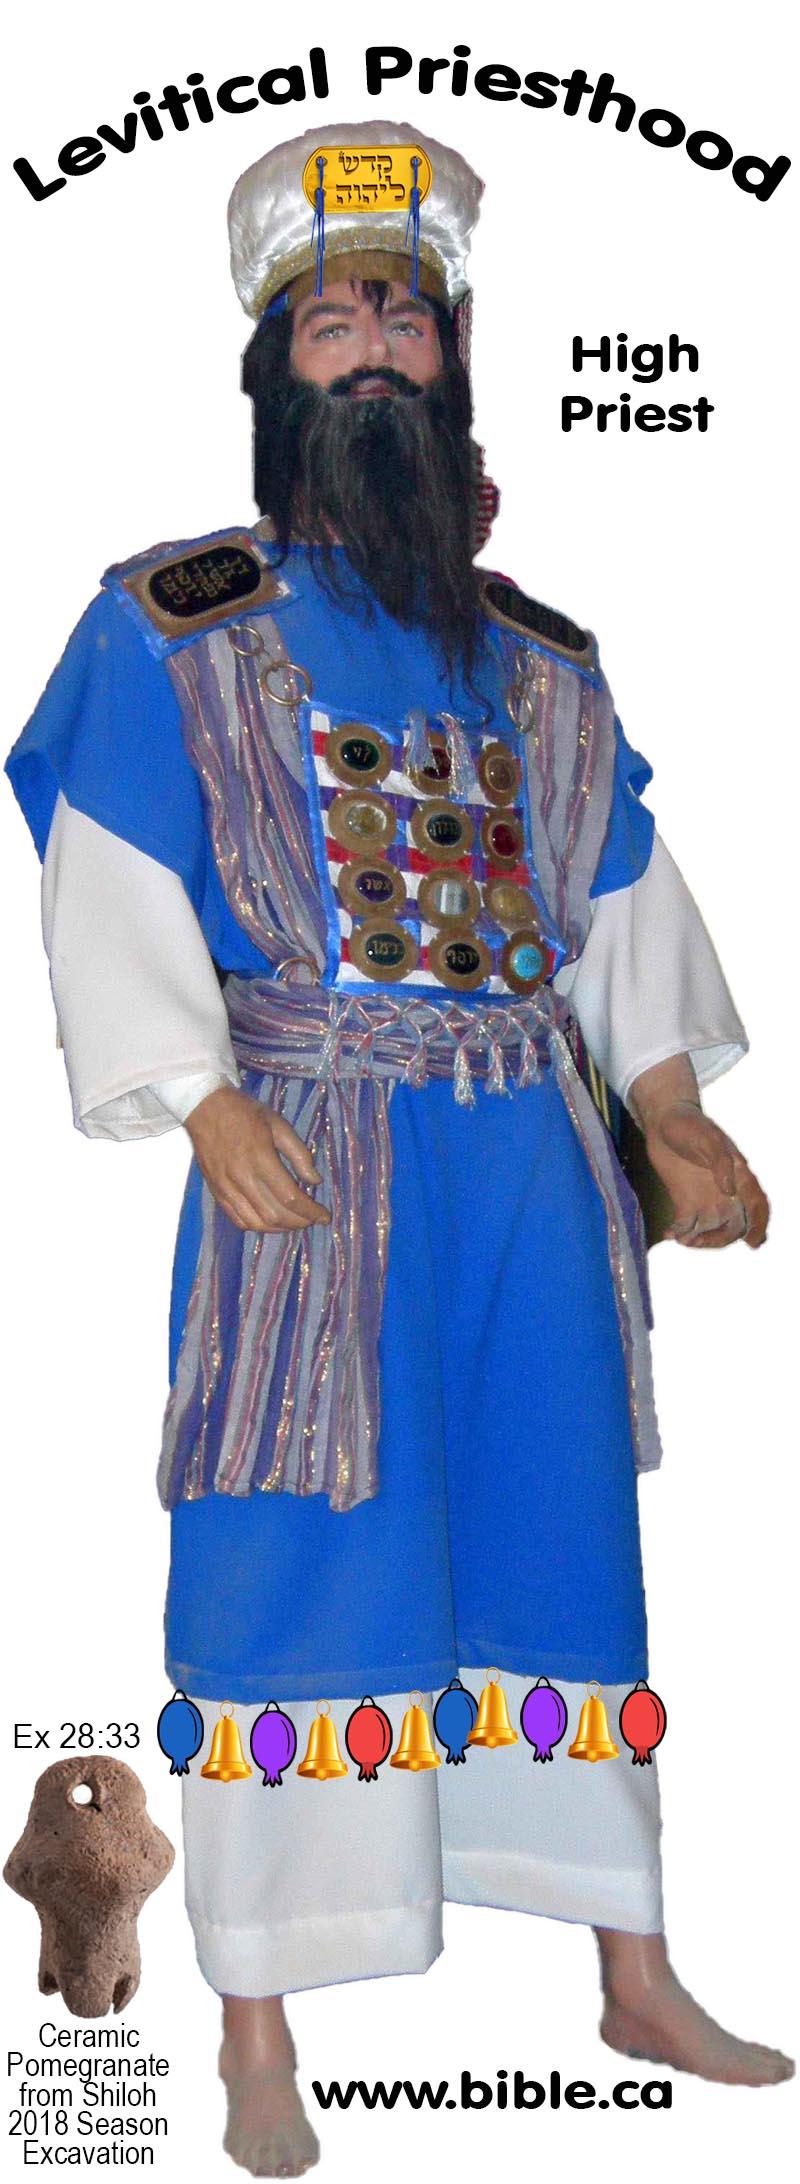 High Priests - Self Prescribed Medication